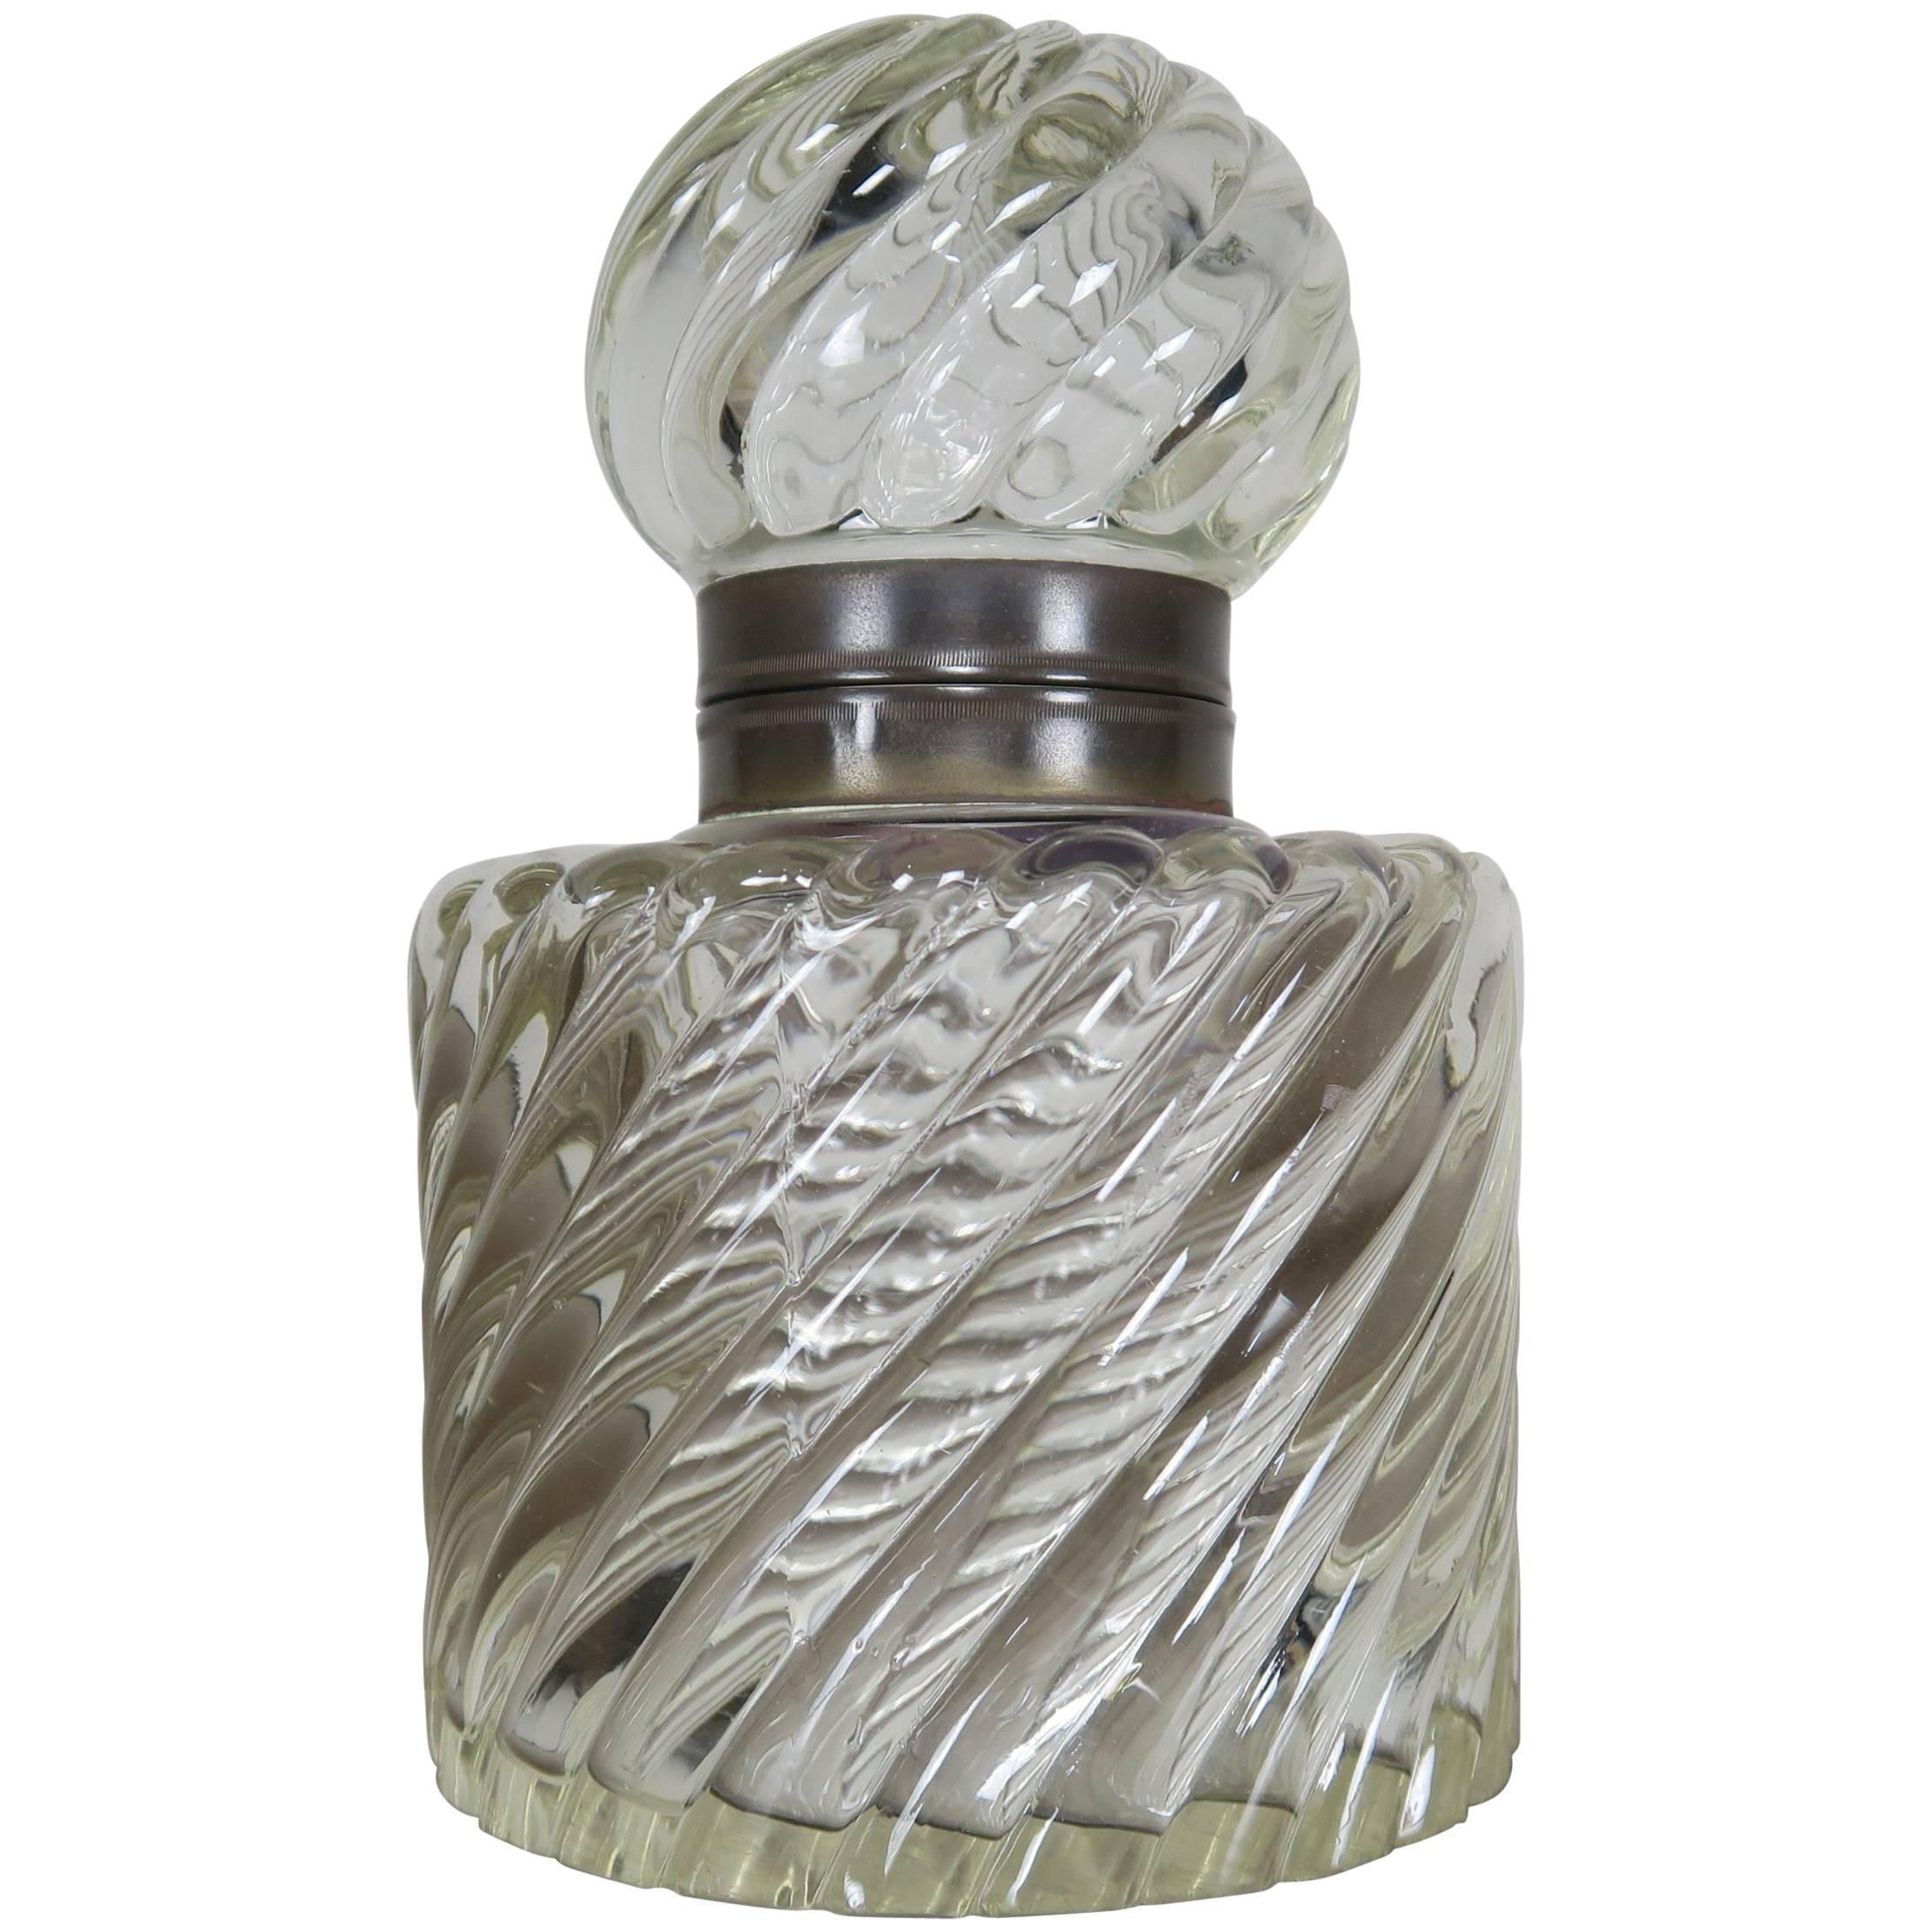 19th Century Baccarat Crystal Swirled Inkwell